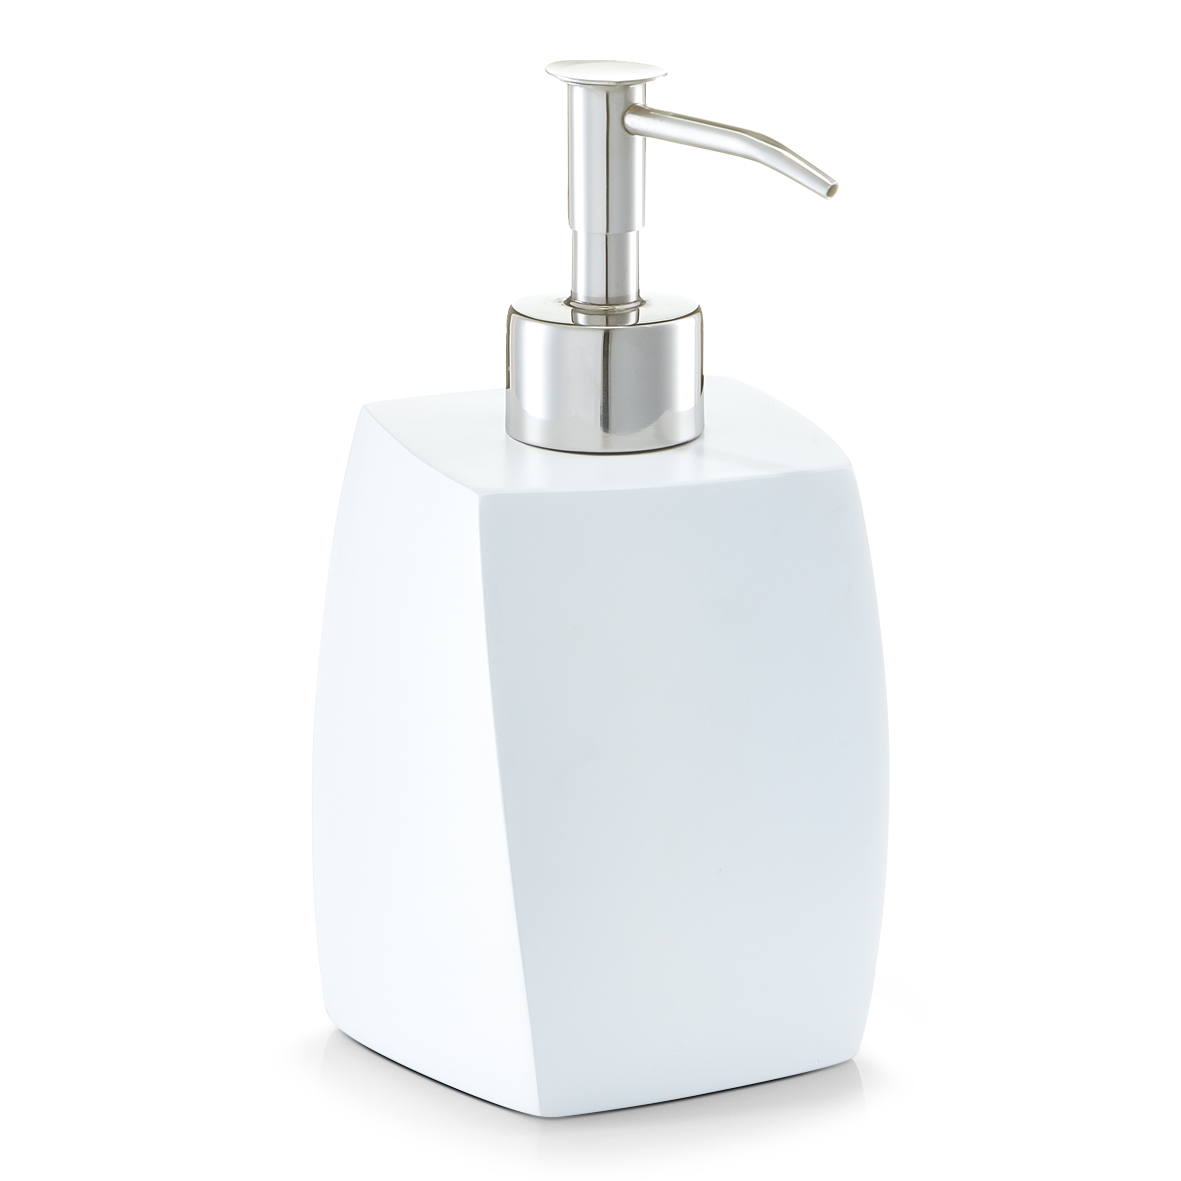 Dozator pentru sapun din polirasina, Twisted White, l8xA8xH16,5 cm